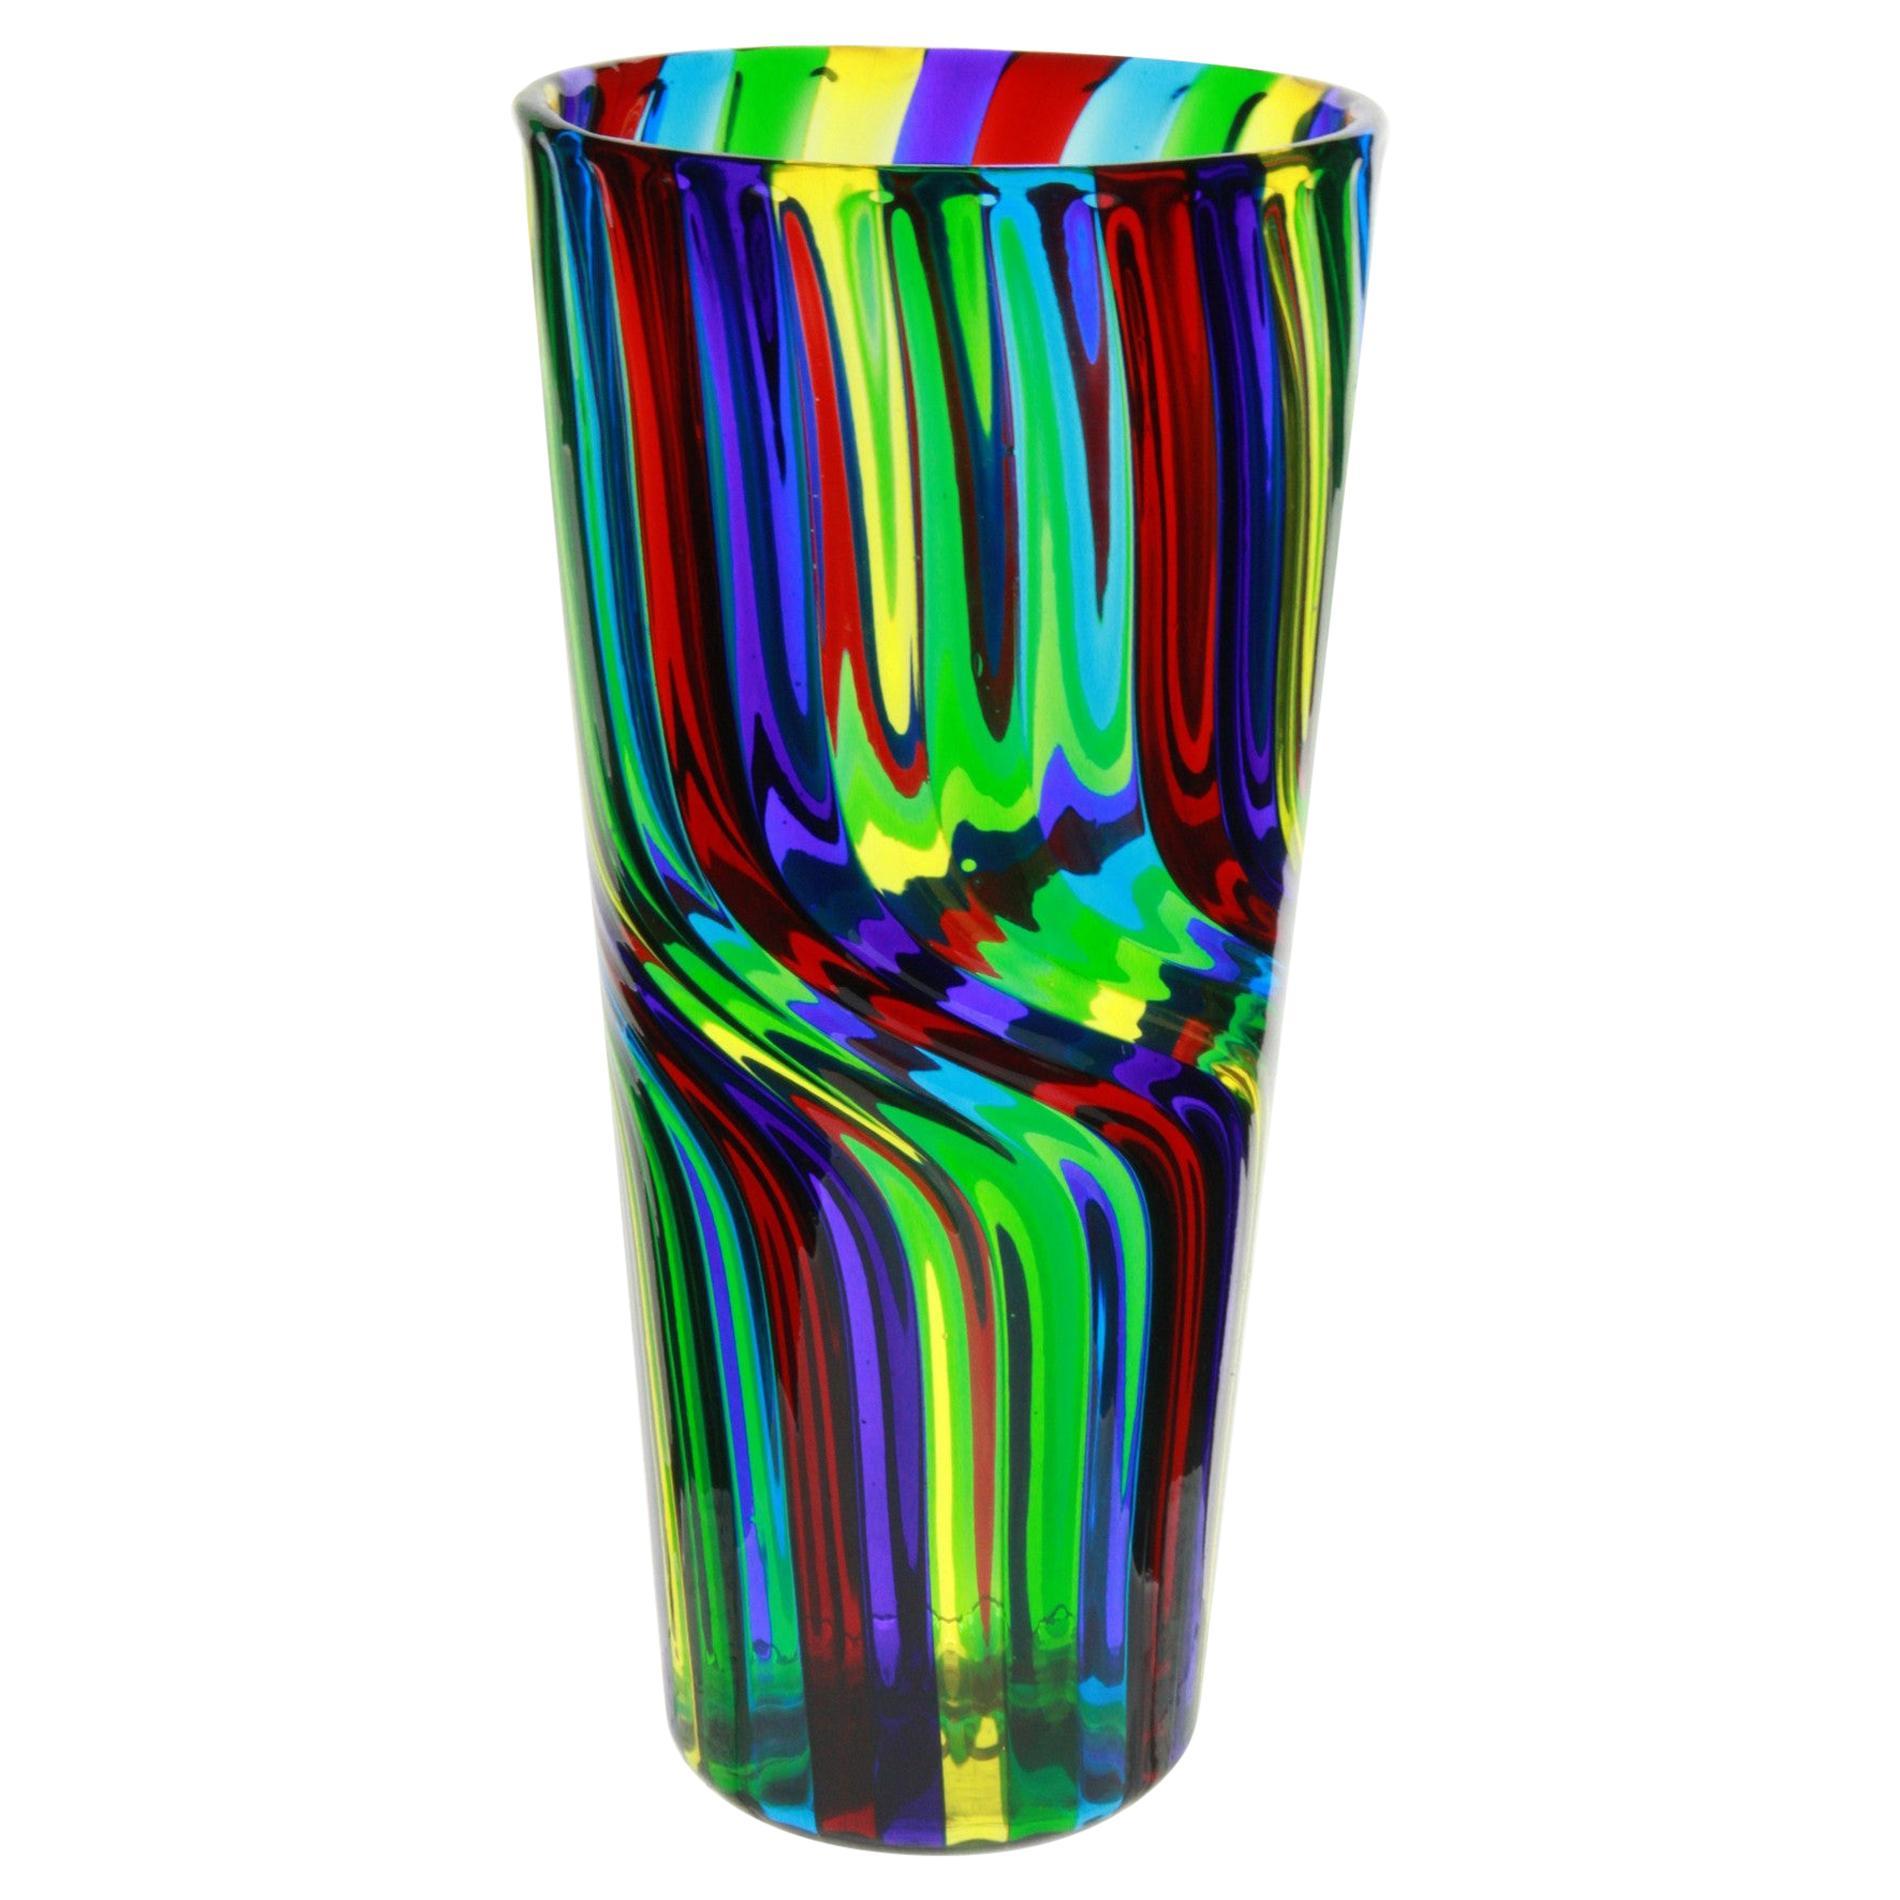 Murano Vase Masterpiece, Doppio Ritorto Amazing Technique, Signed